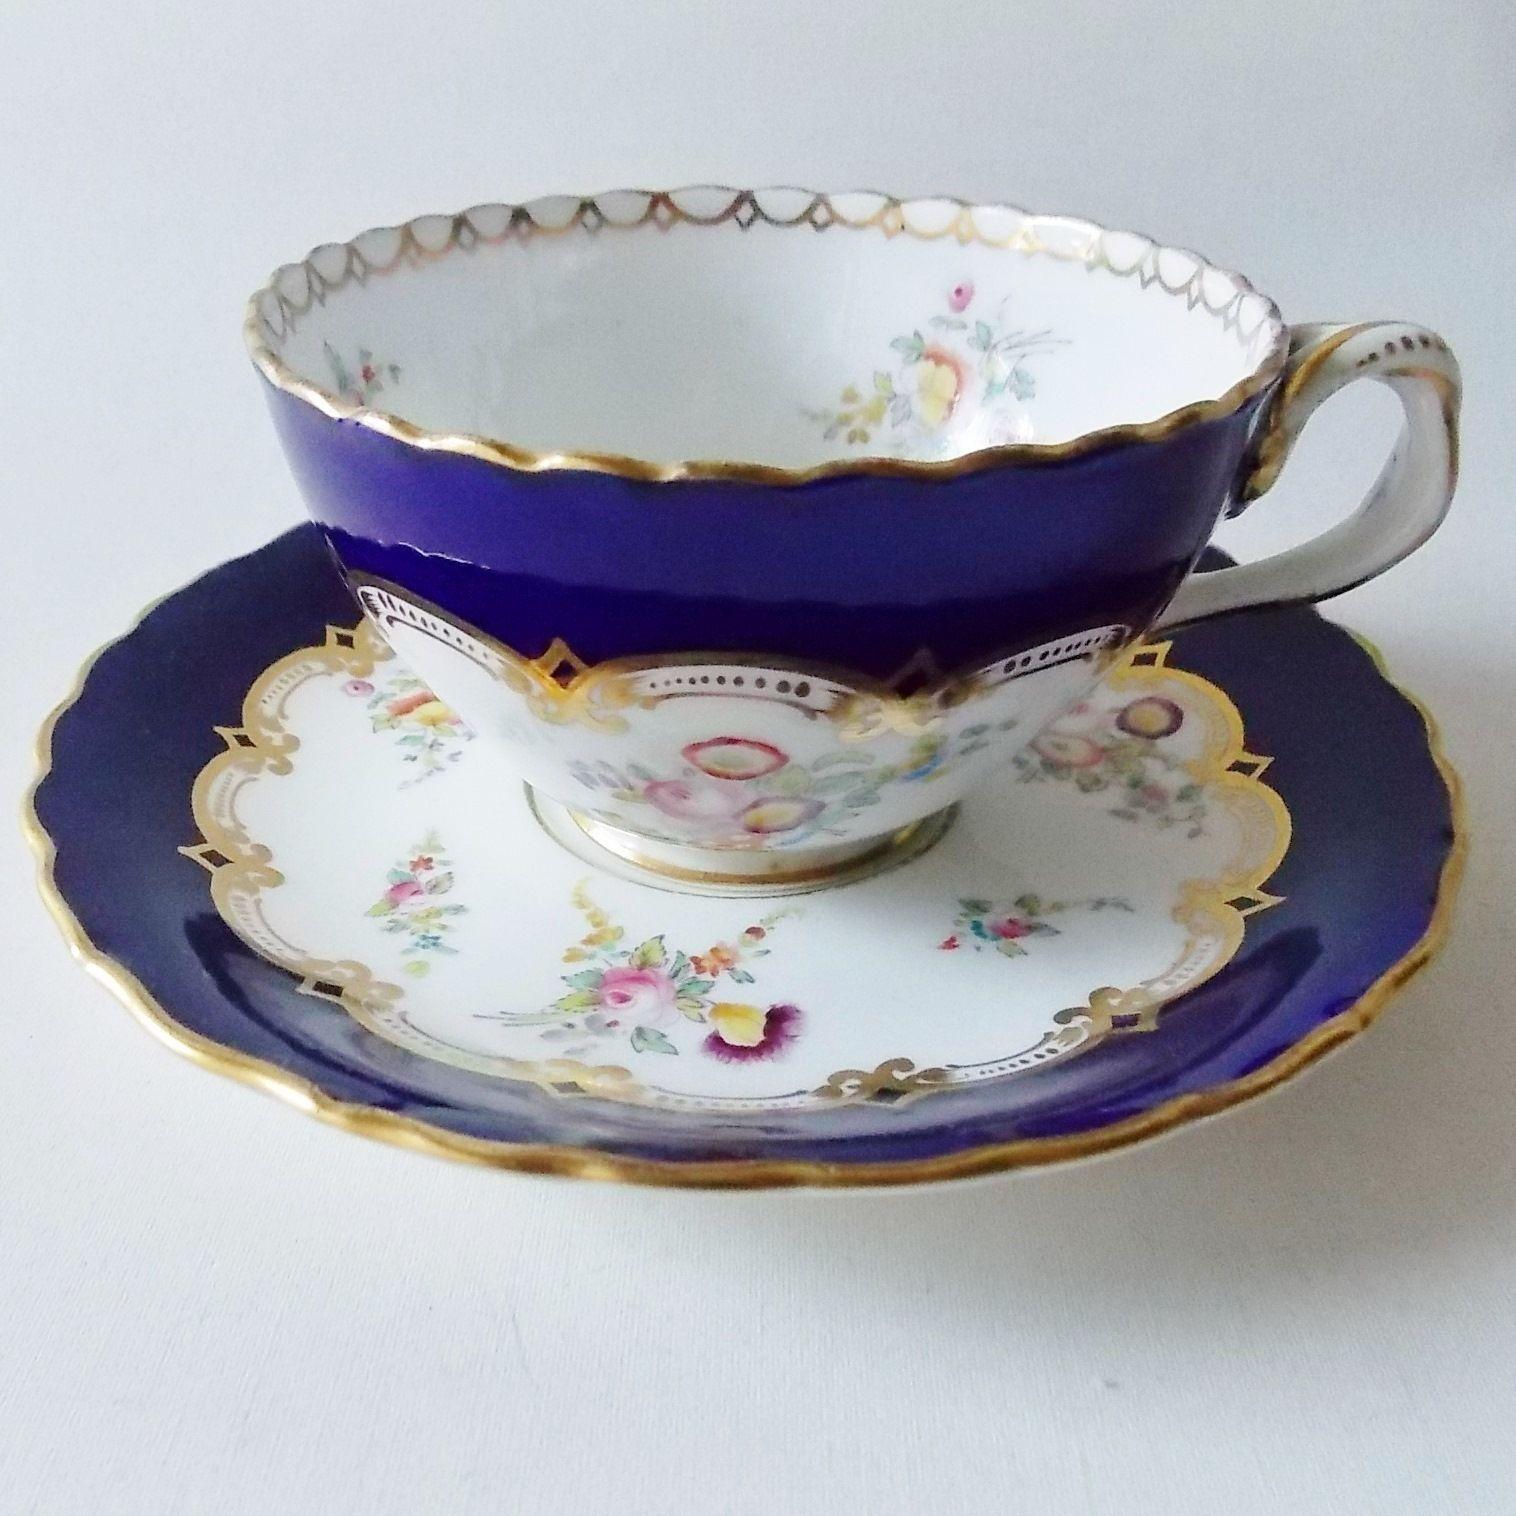 ANTIQUE COALPORT HANDPAINTED CUP AND SAUCER COBALT BLUE MULTICOLORED FLOWERS | eBay